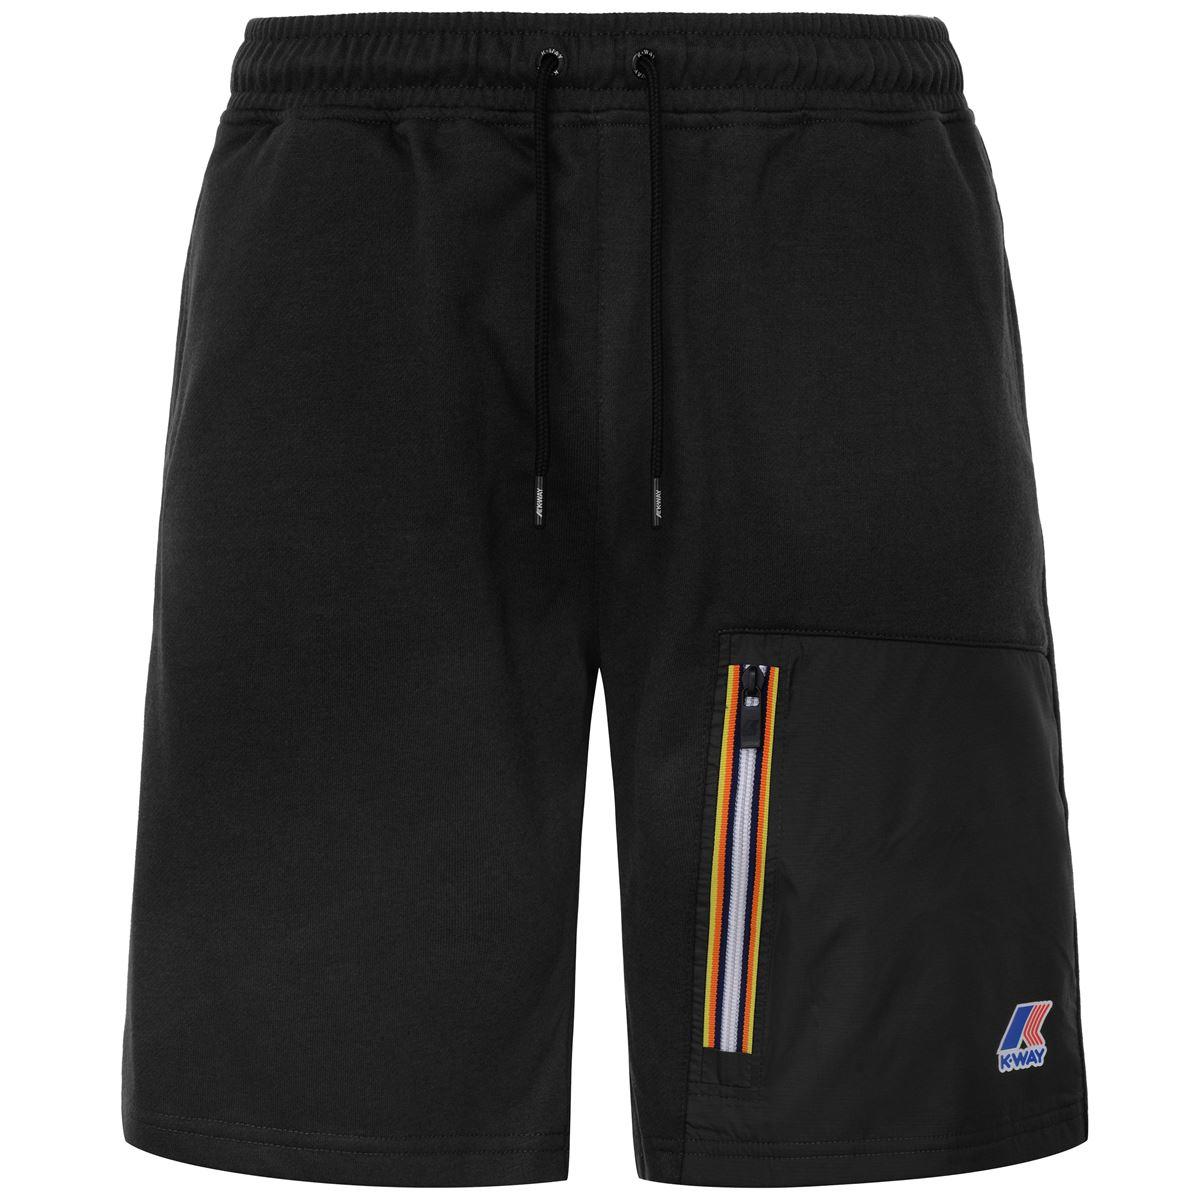 Shorts Le vrai gontrand K-way K-WAY | Shorts | K00BET0-GONTRANDK02